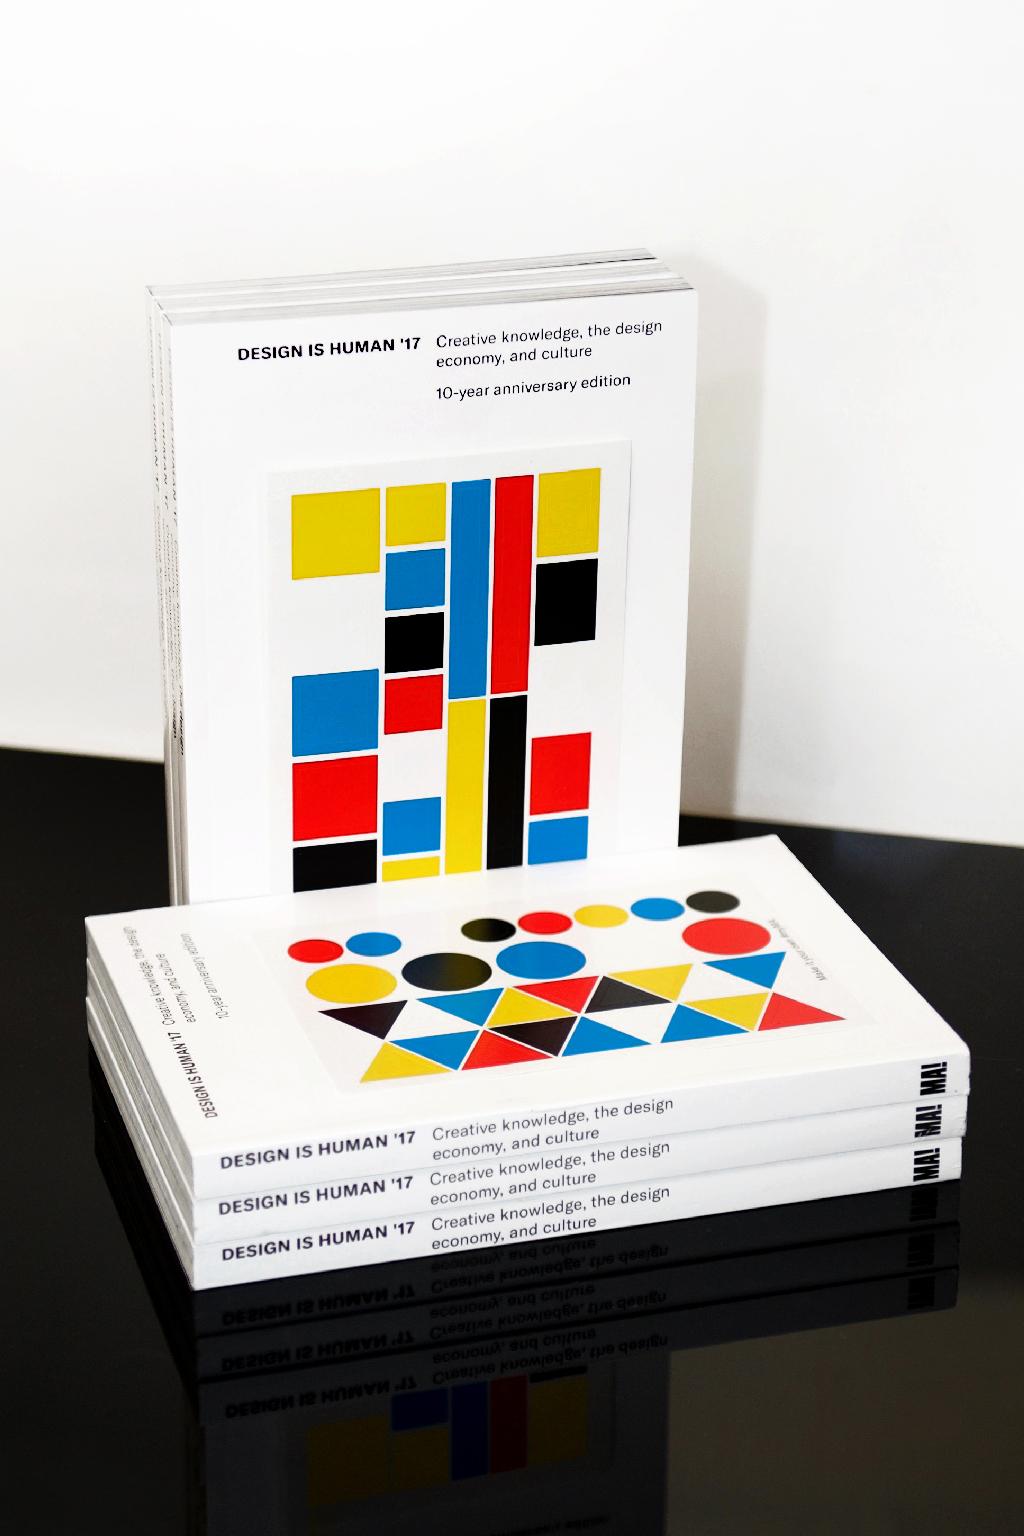 Studio-Verena-Hennig-Atlanta-Design-Festival-Book-Design-2017.jpg